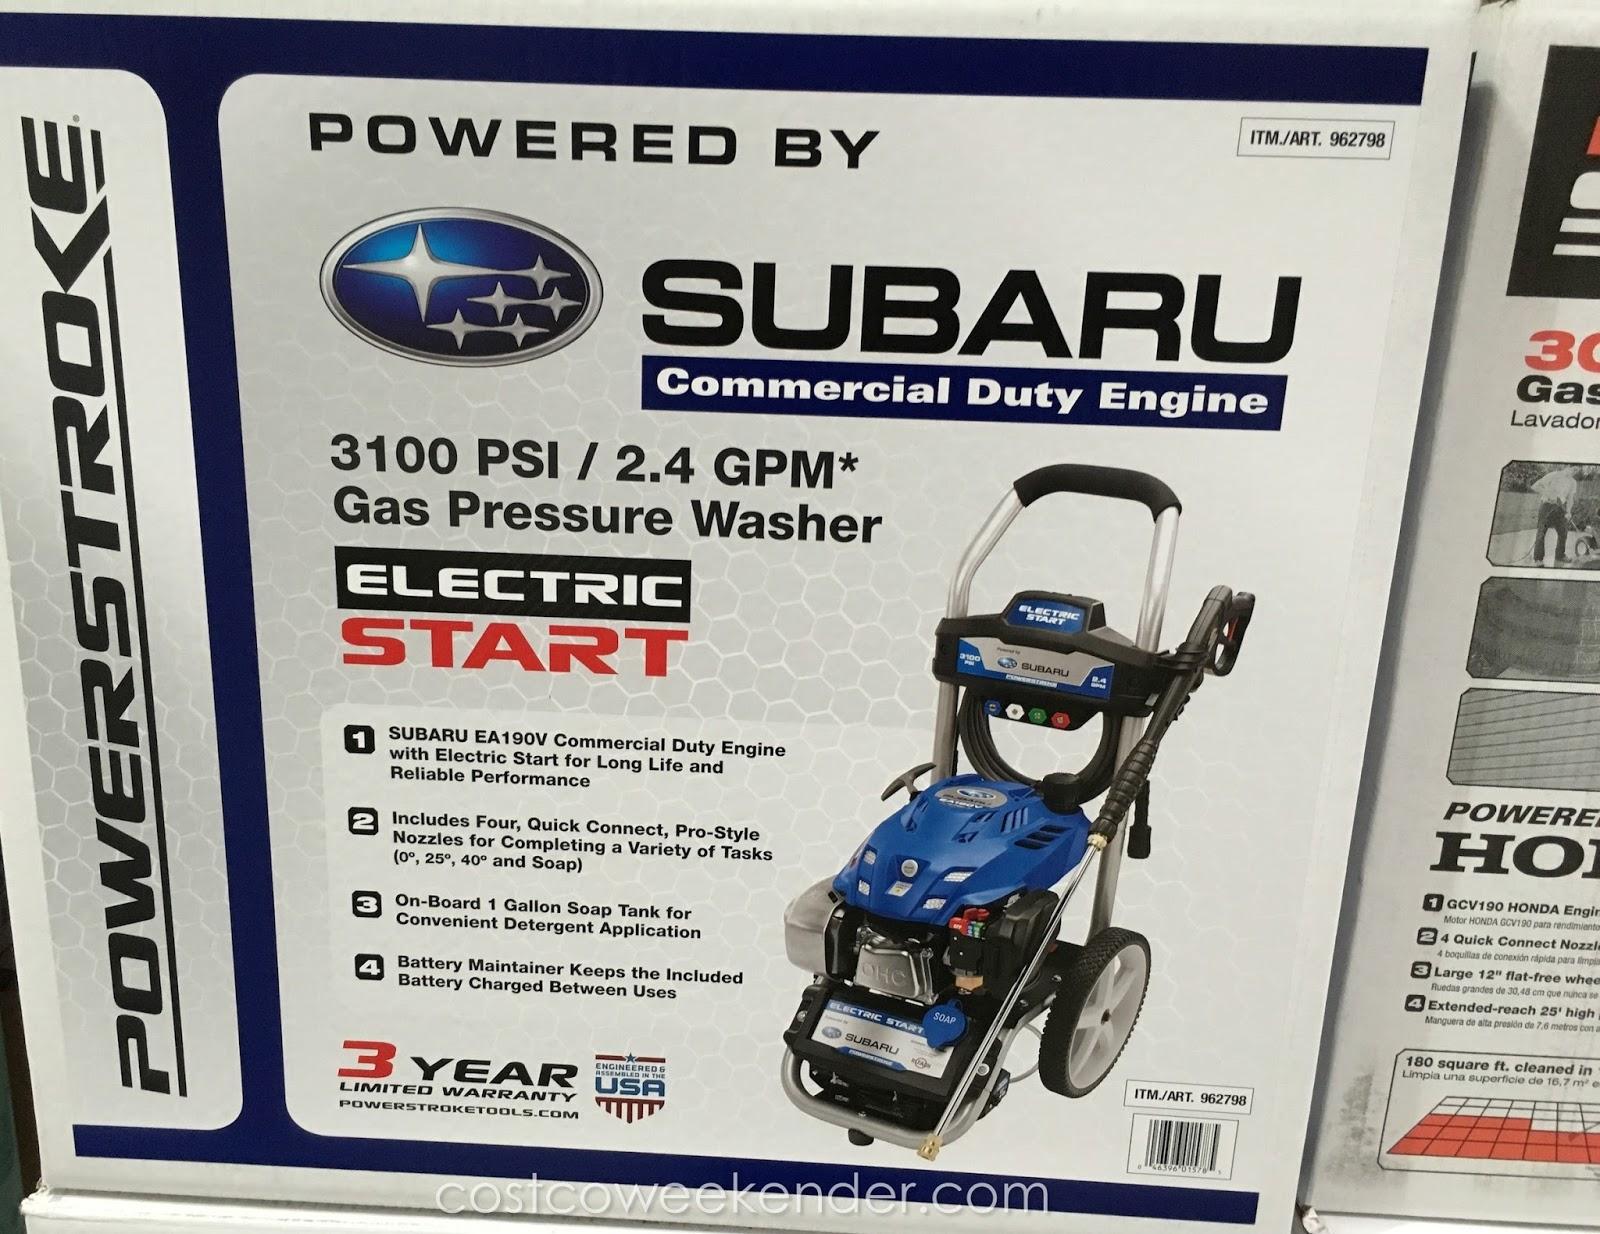 Subaru South Blvd >> Powerstroke 3100psi Electric Start Gas Pressure Washer   Costco Weekender